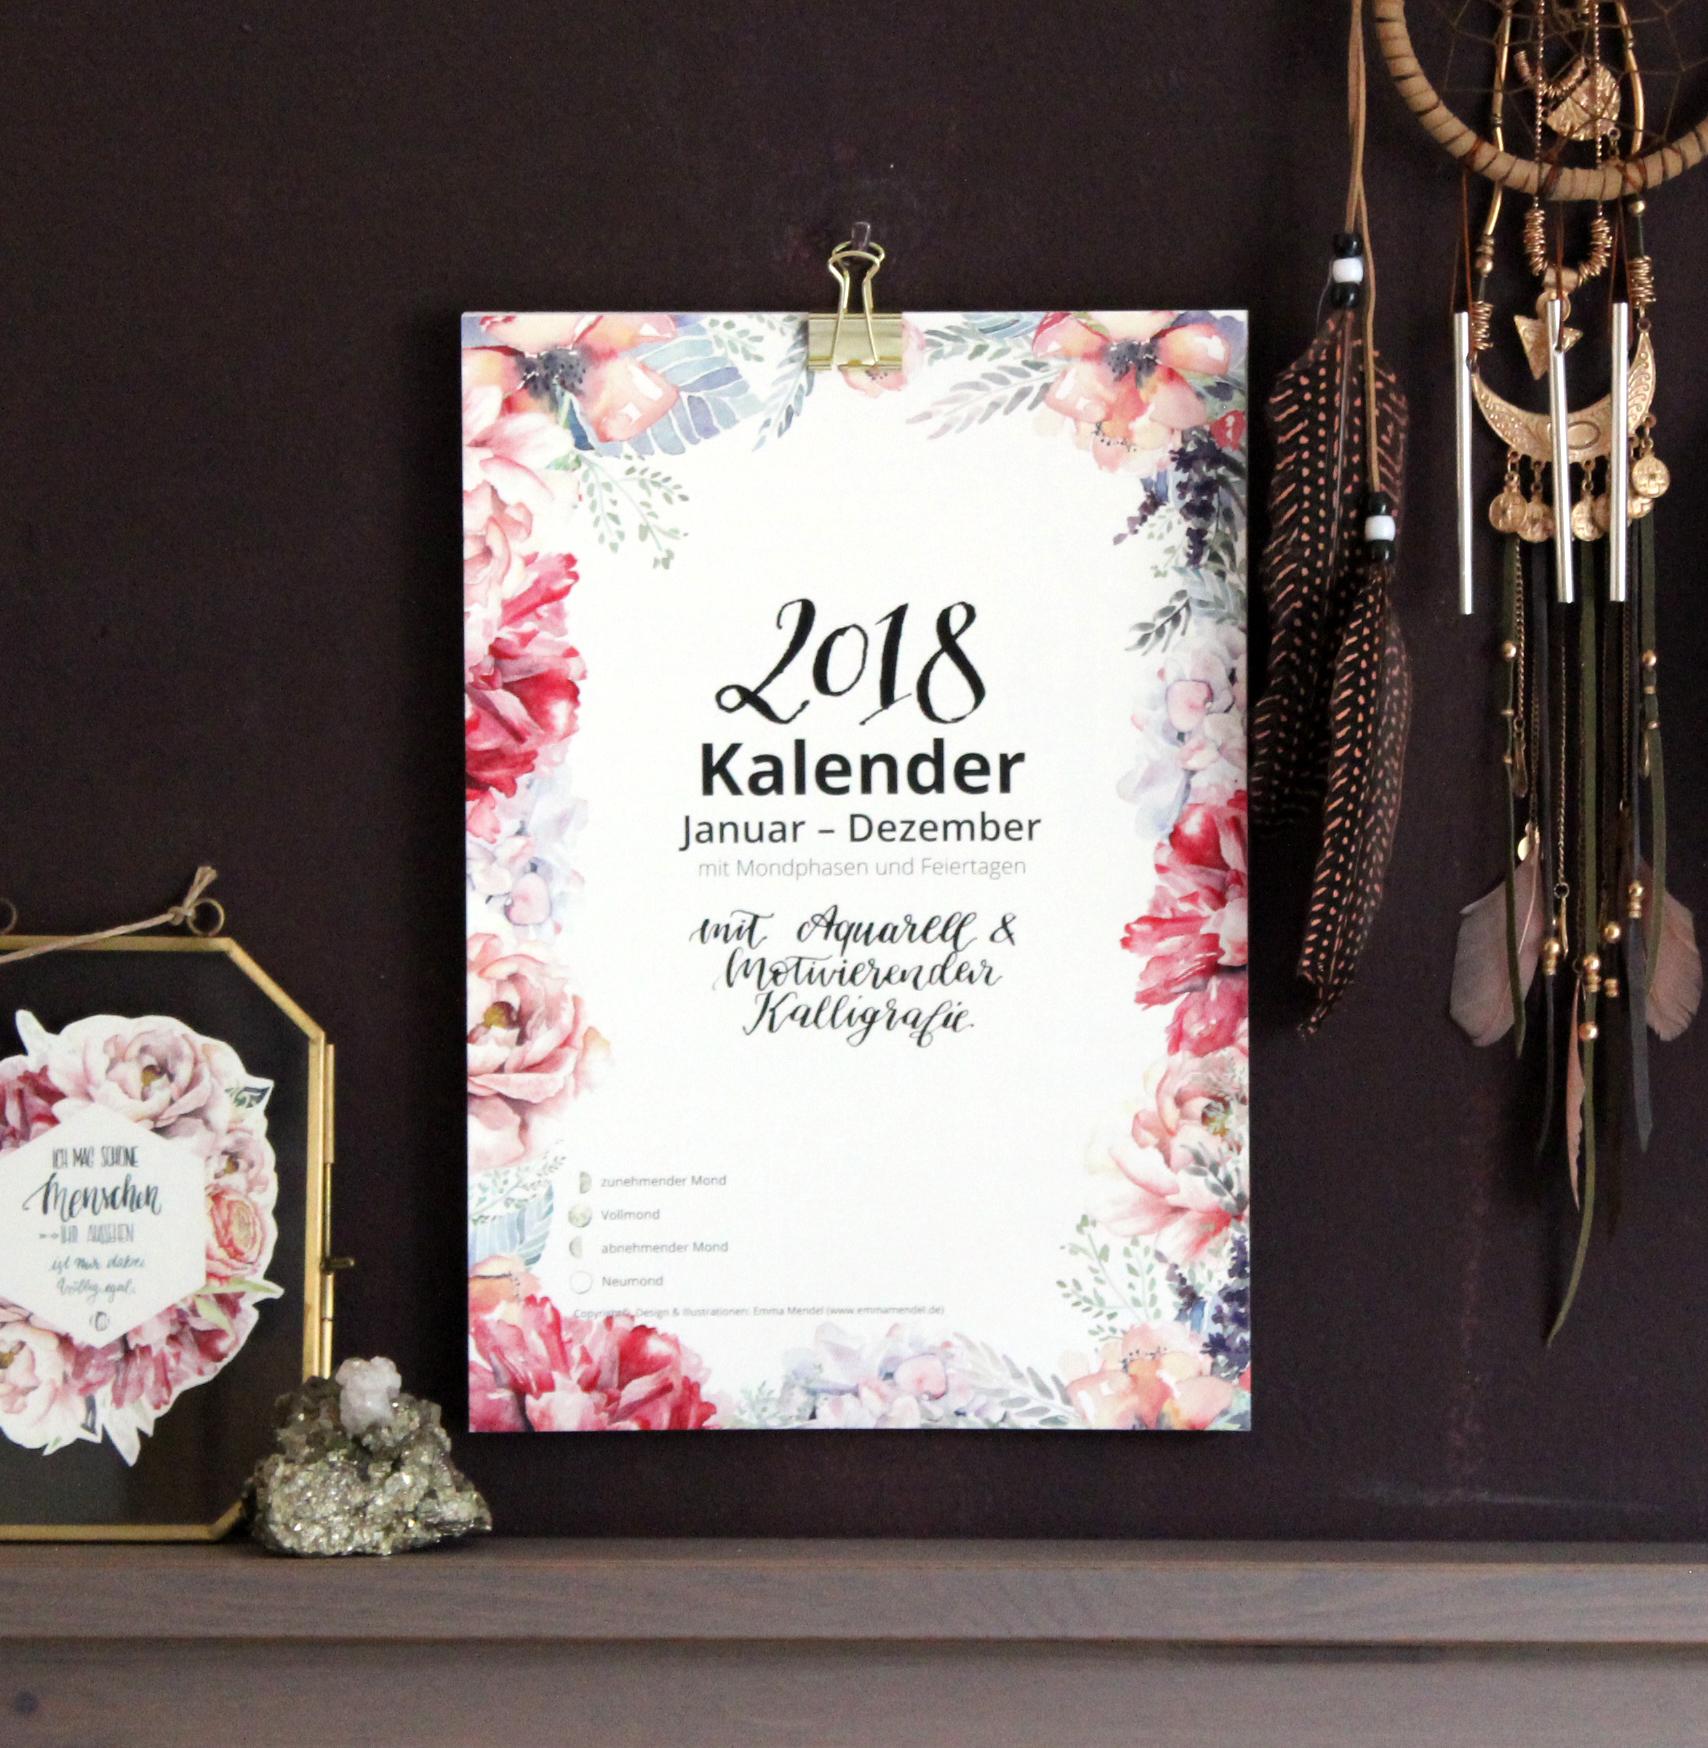 kal-a4-kalligrafie-2018